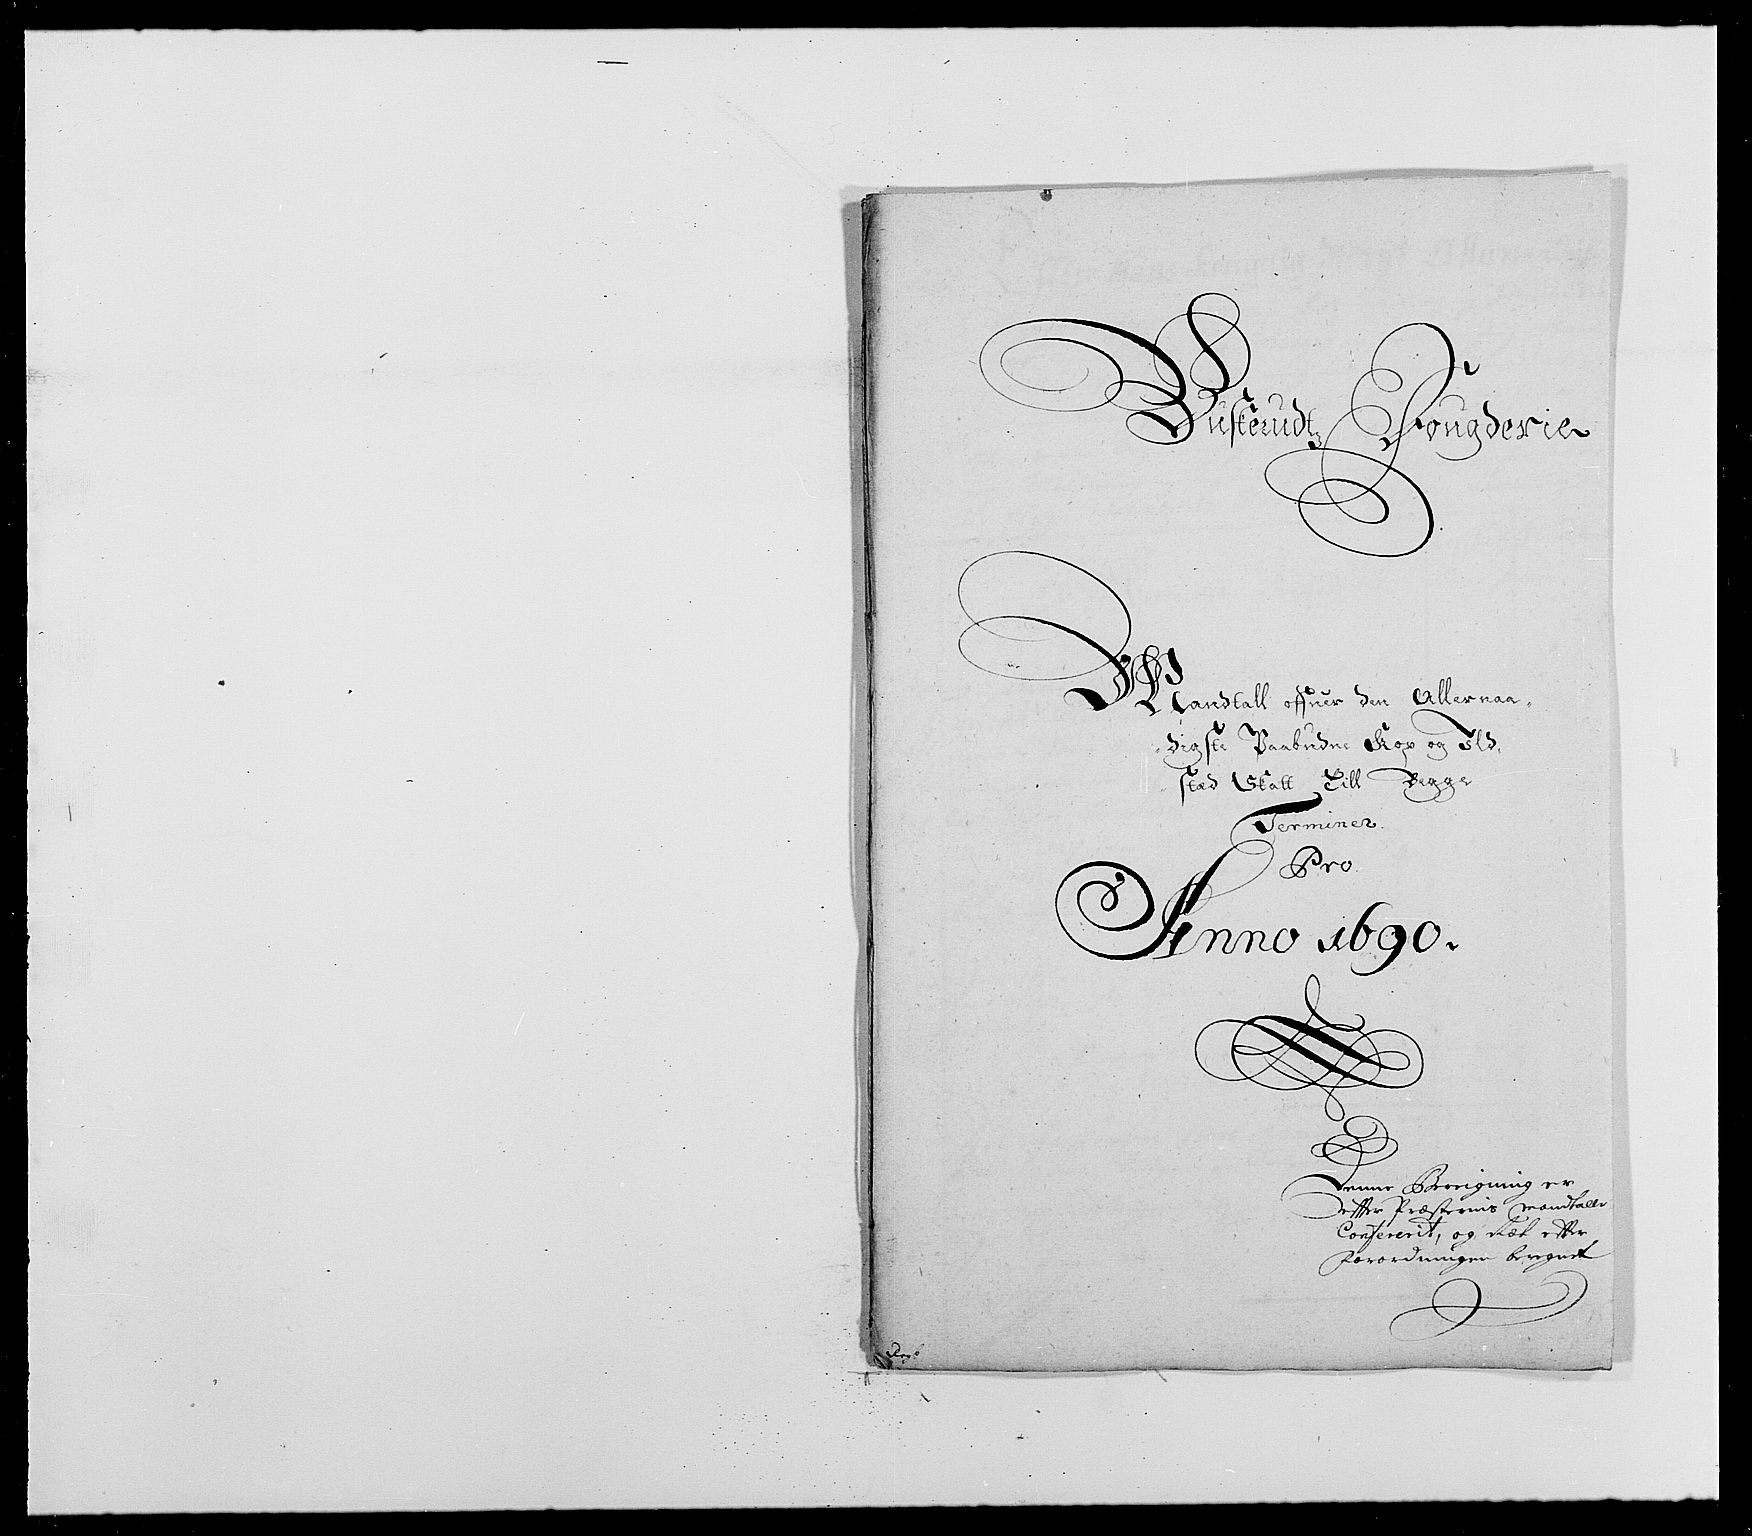 RA, Rentekammeret inntil 1814, Reviderte regnskaper, Fogderegnskap, R25/L1680: Fogderegnskap Buskerud, 1689-1690, s. 436